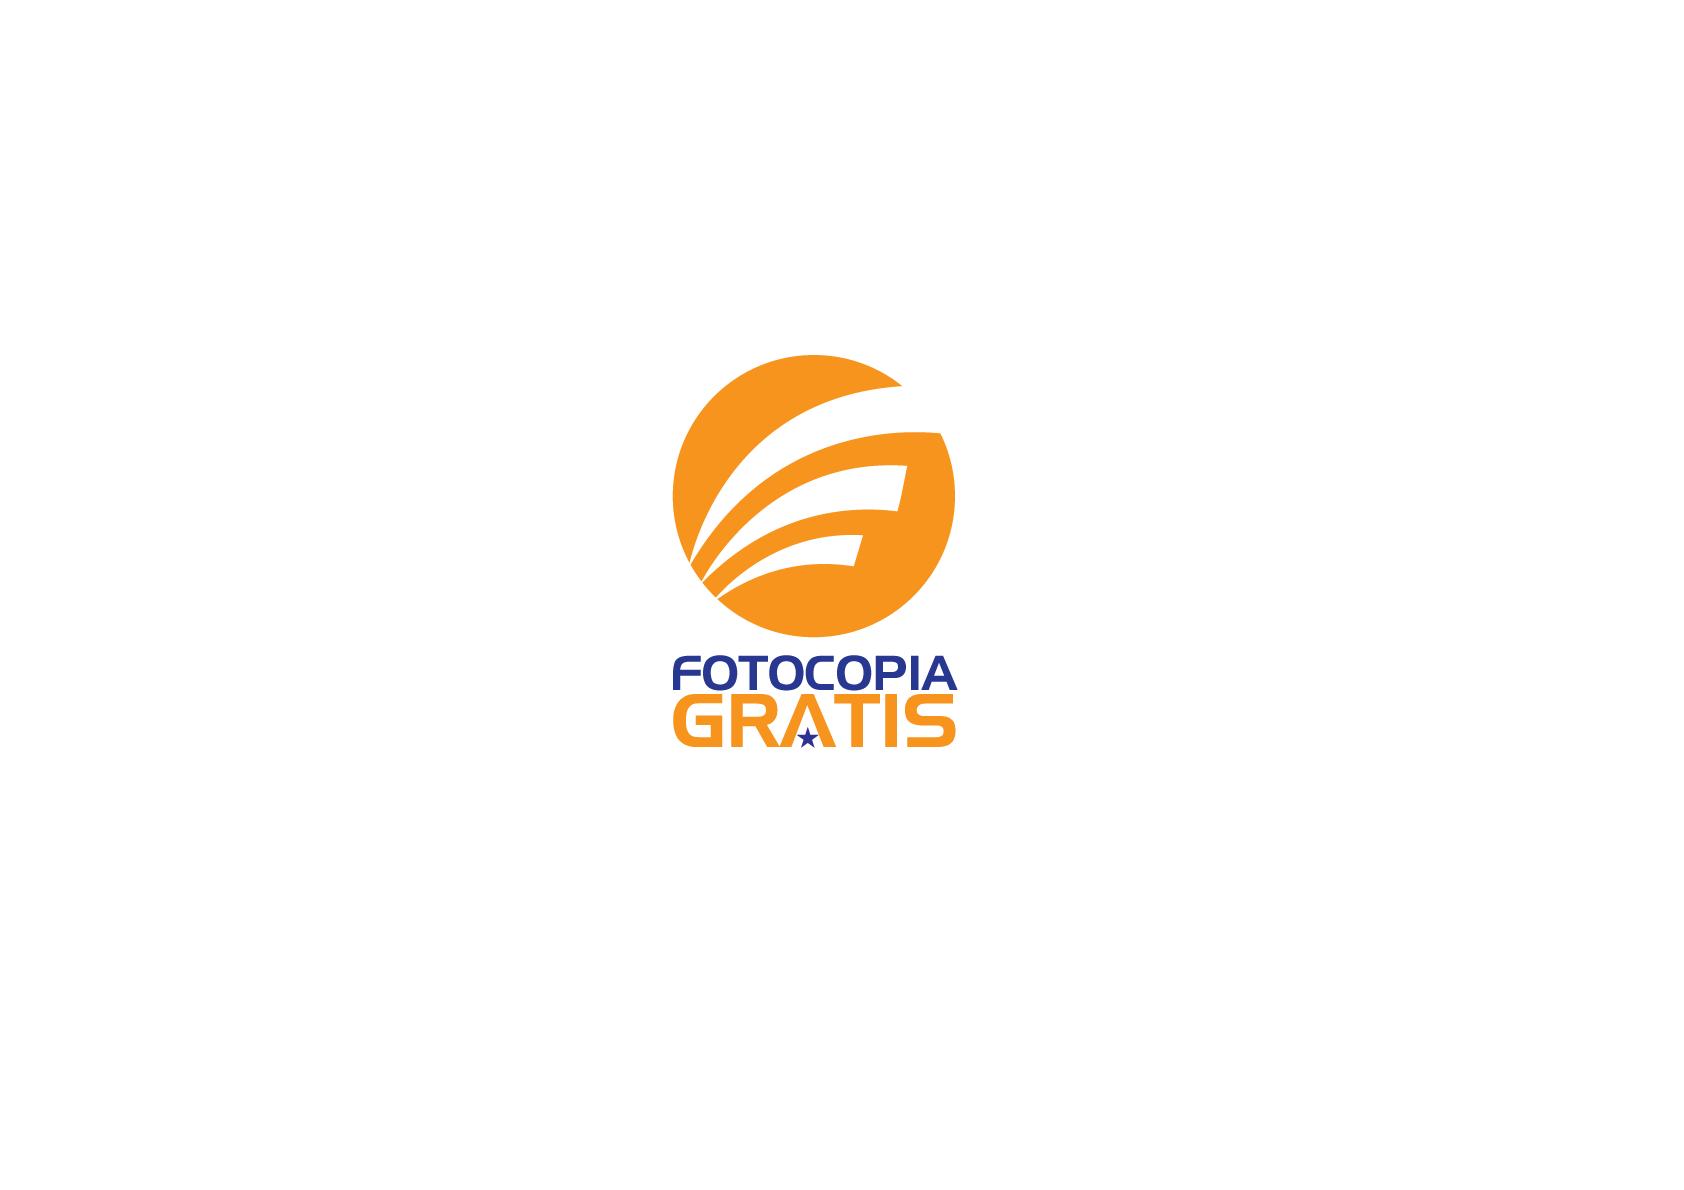 Logo Design by Severiano Fernandes - Entry No. 216 in the Logo Design Contest Inspiring Logo Design for Fotocopiagratis.